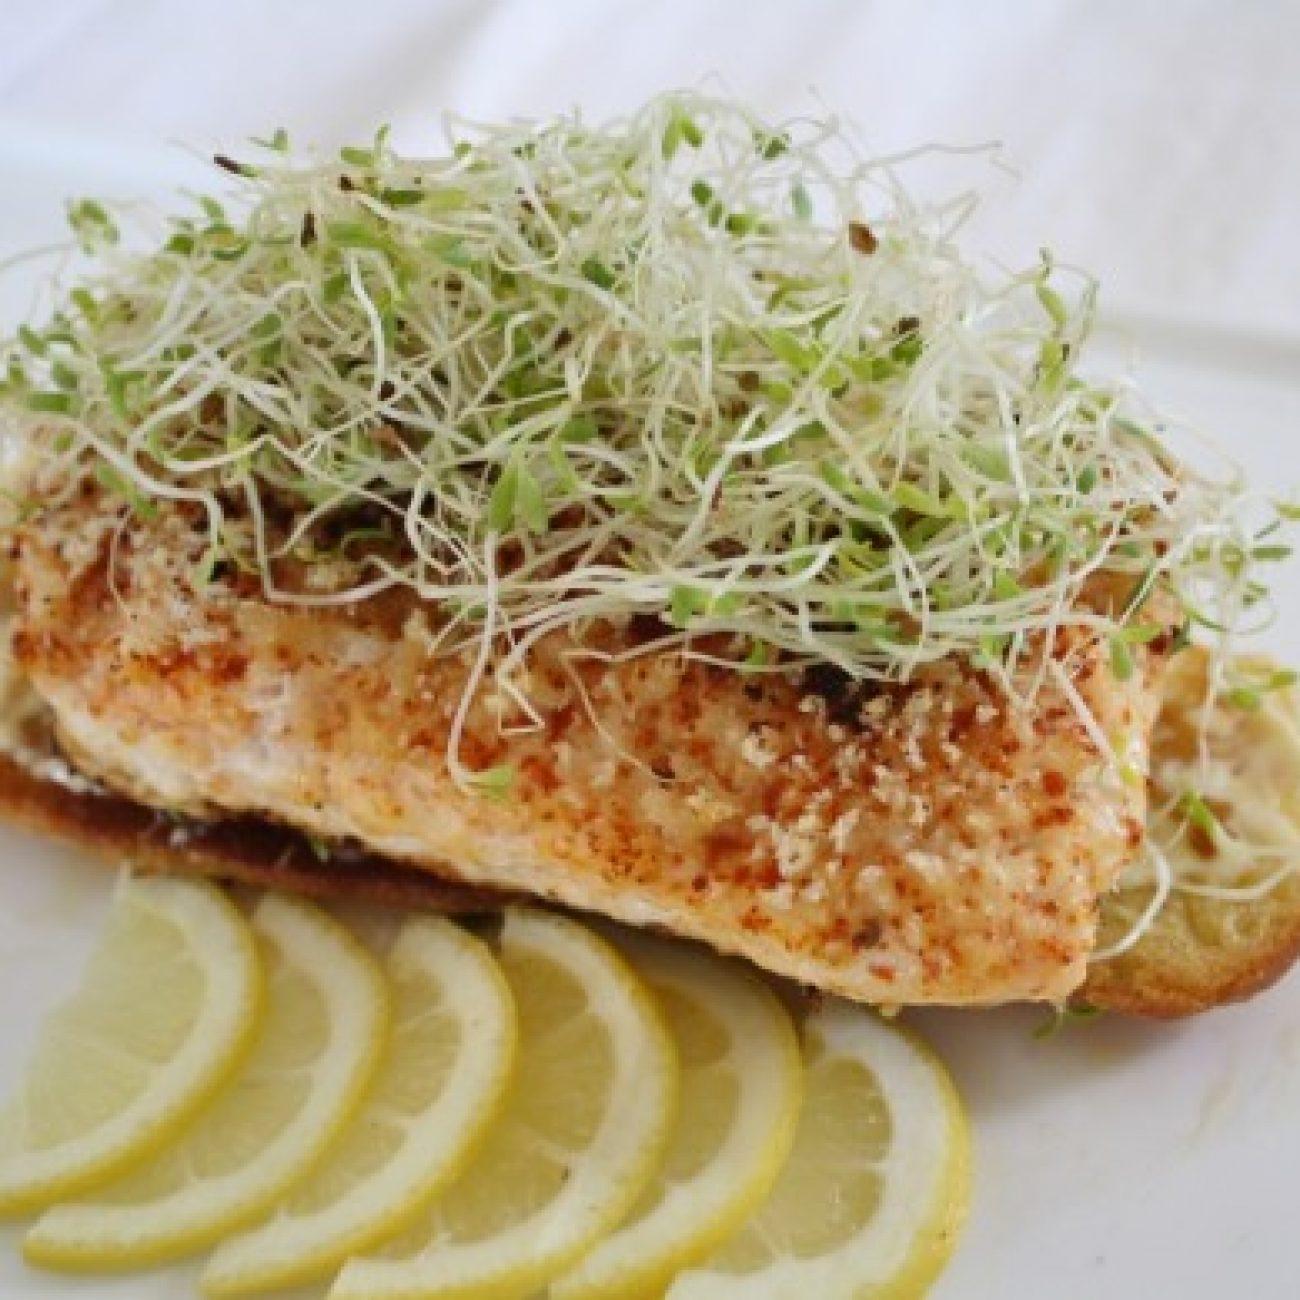 Lemon Sole on Lemon Aioli Toastie (kicked up fish sandwich)